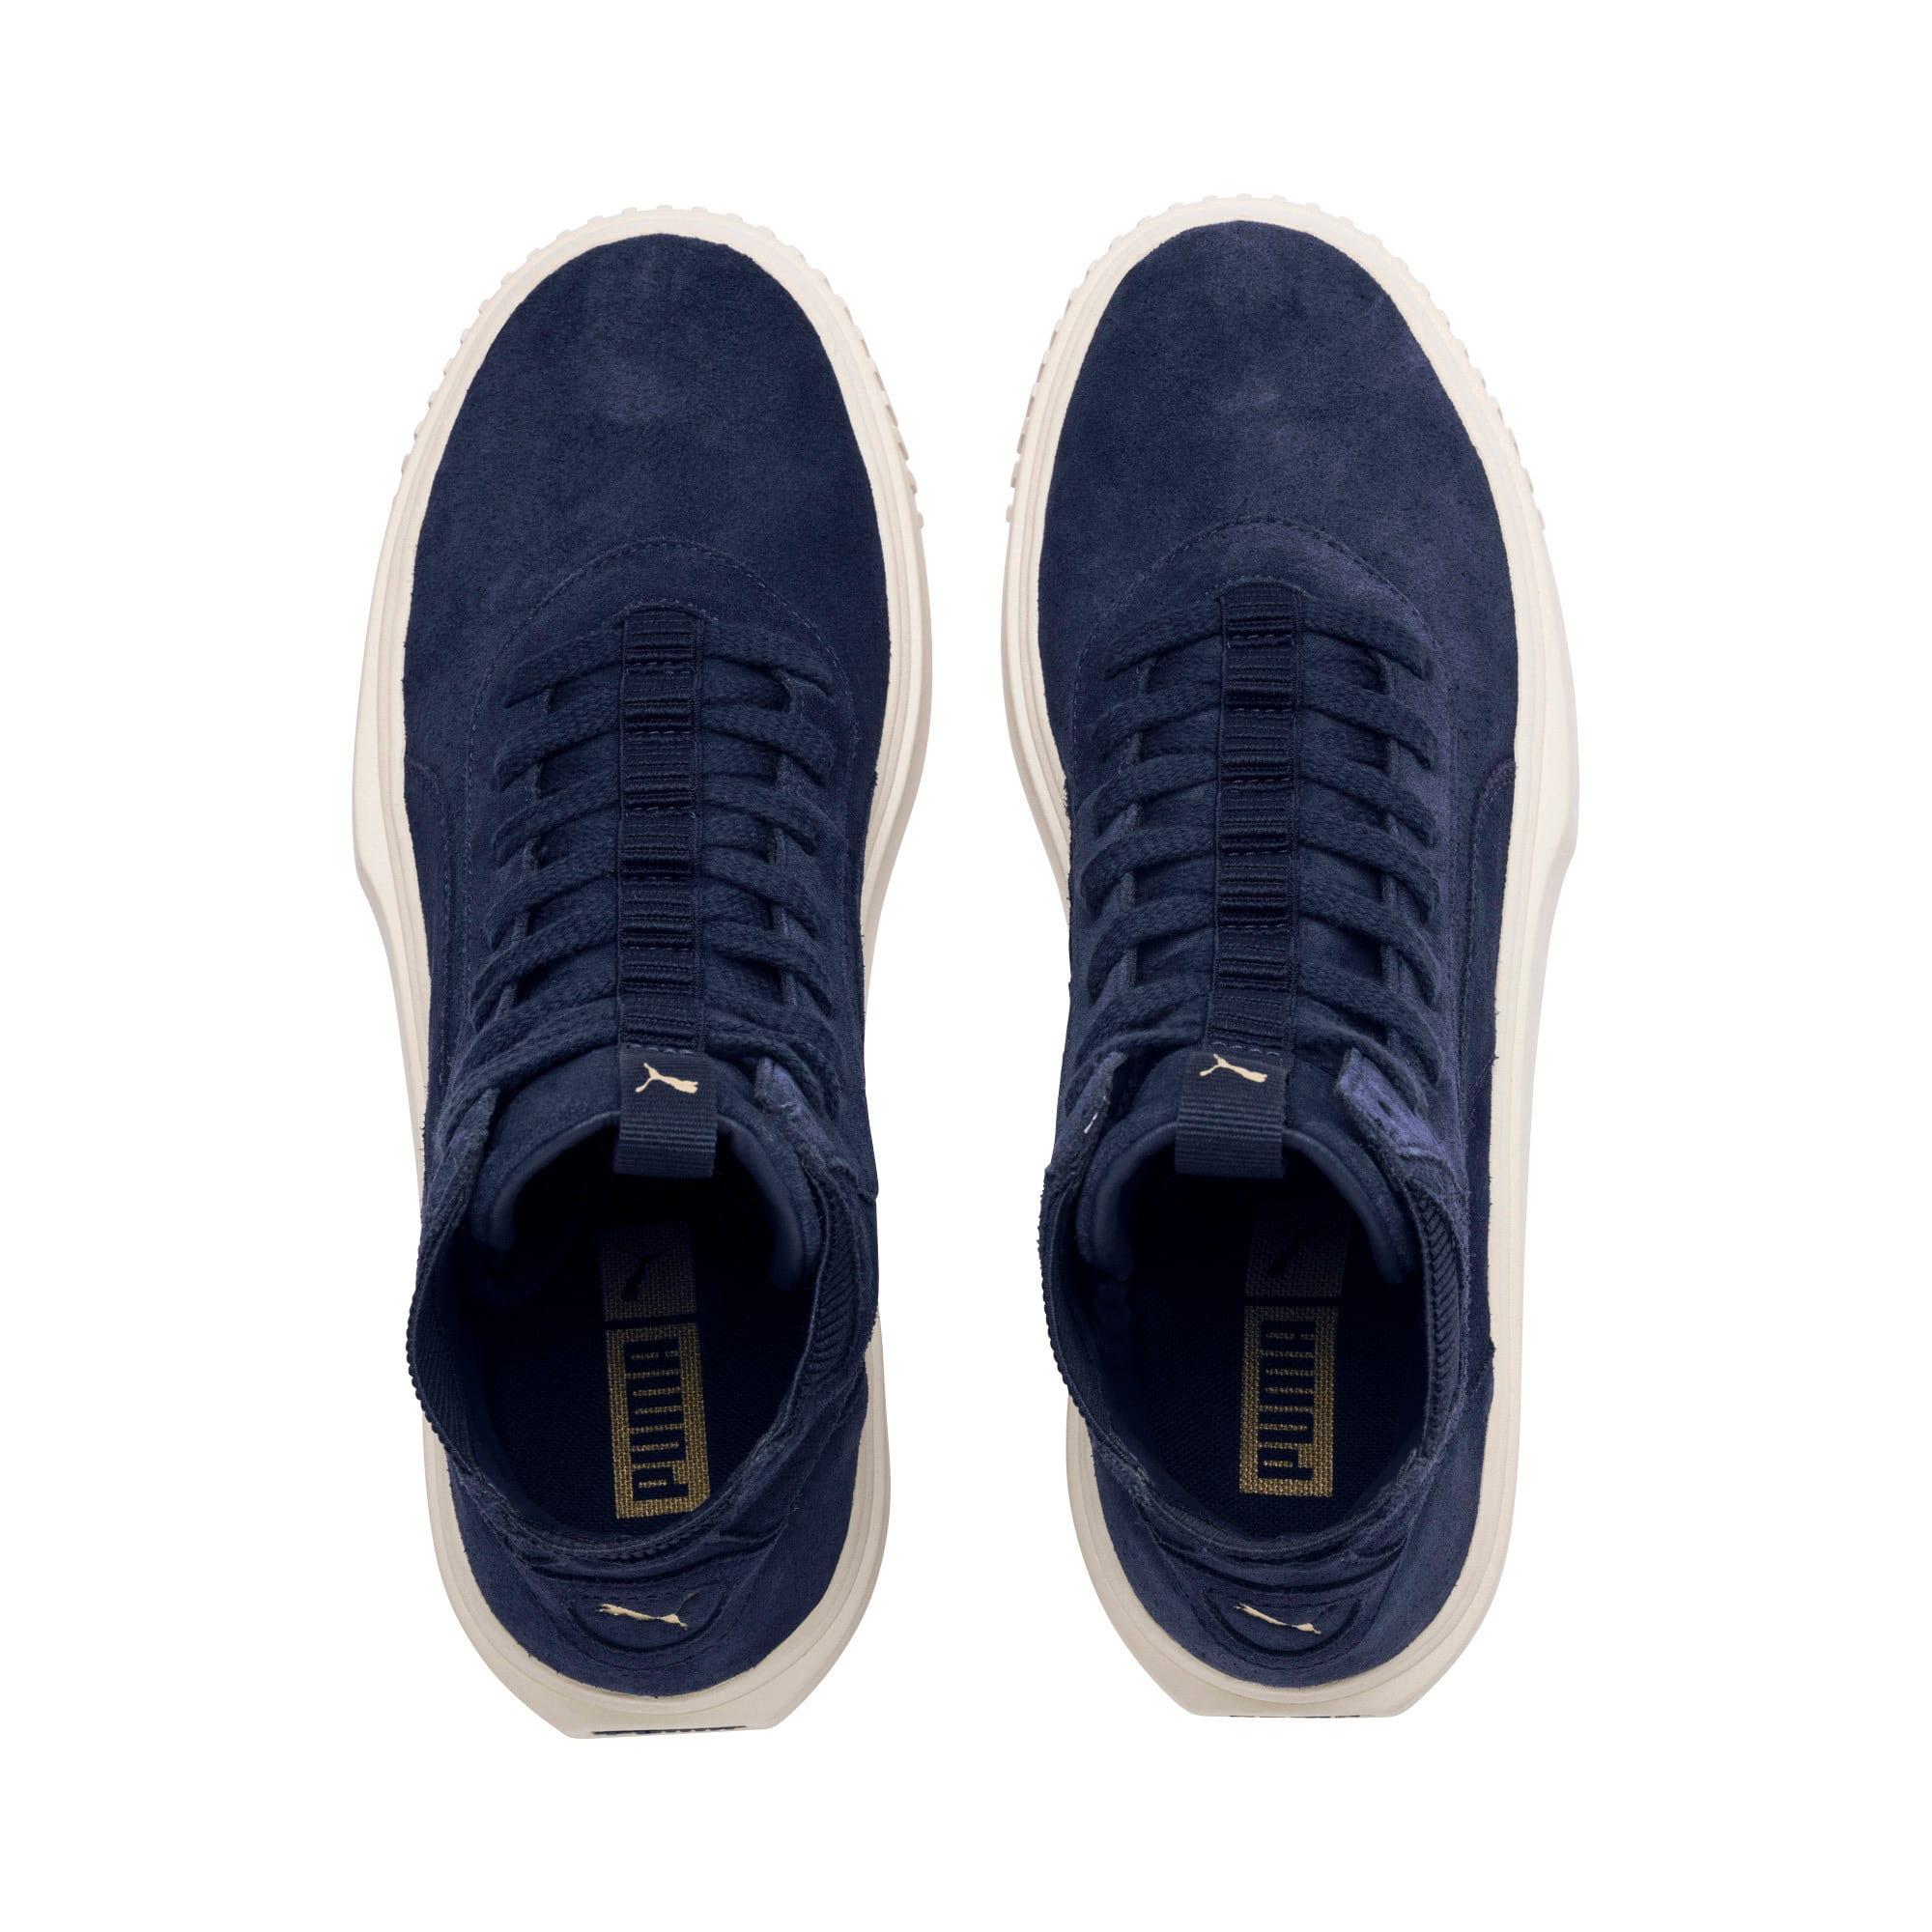 Thumbnail 6 of PUMA Breaker Hi Evolution Sneakers, Peacoat-Whisper White, medium